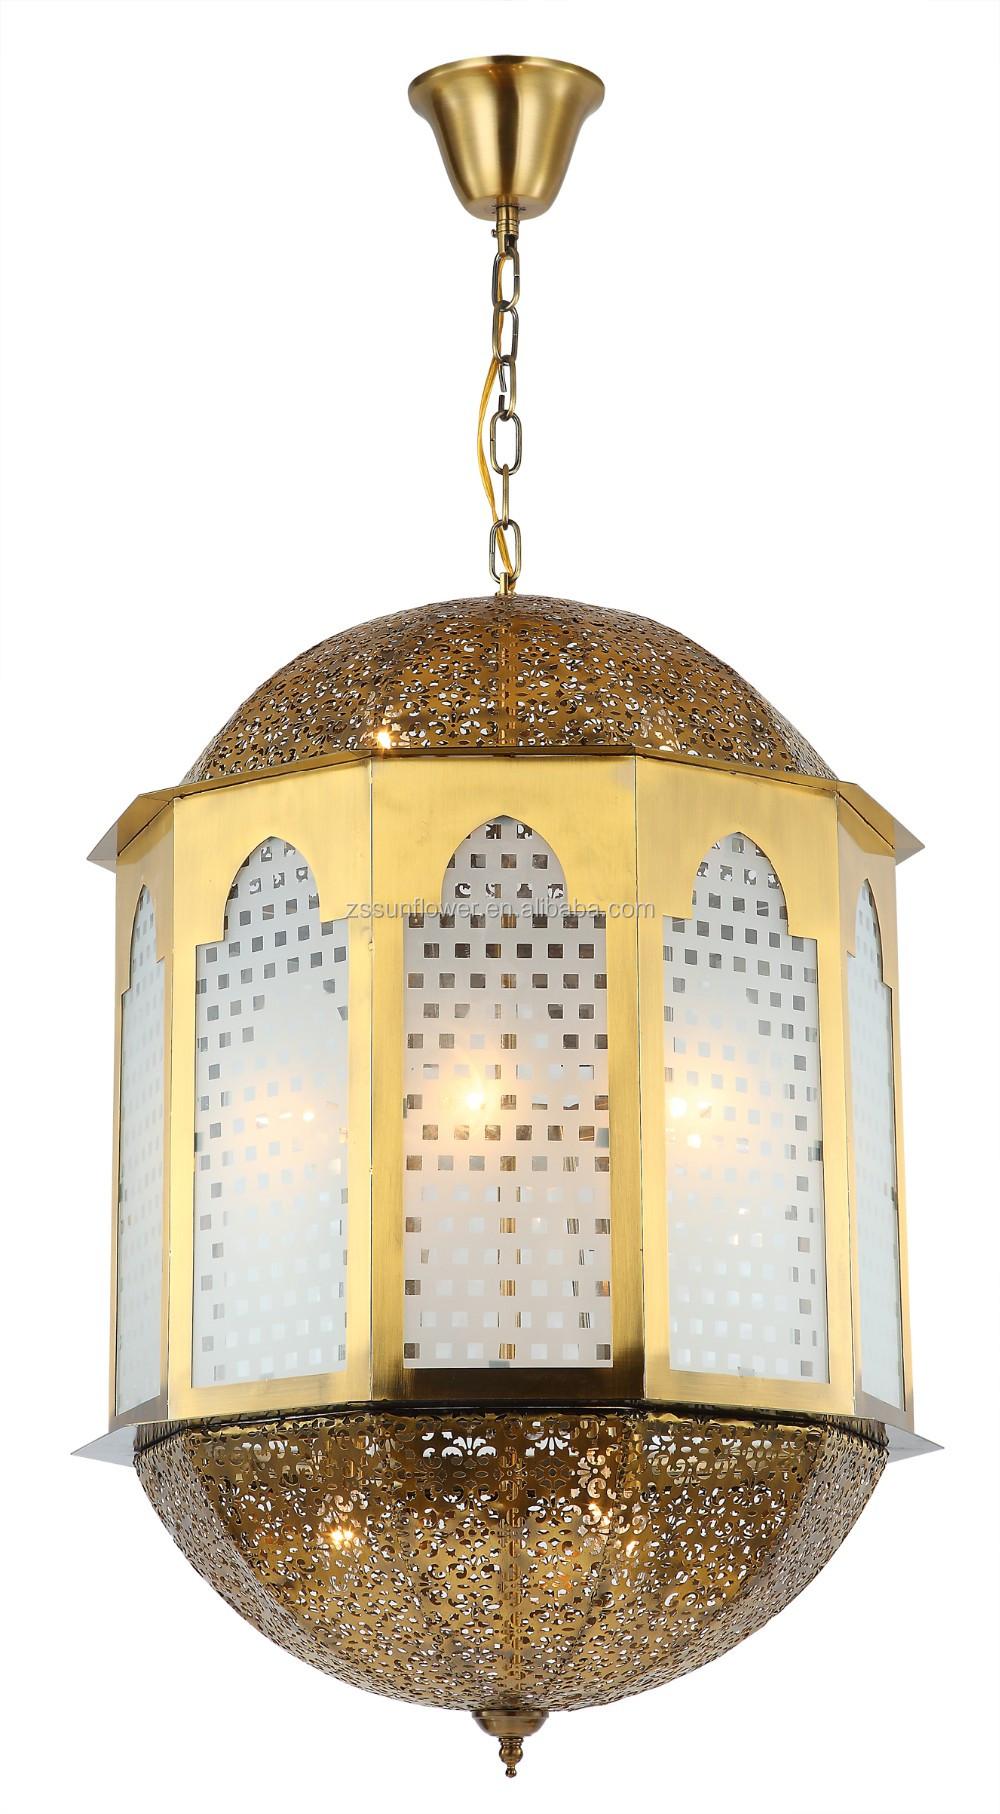 Mohammedan Hanging Pendant Lighting